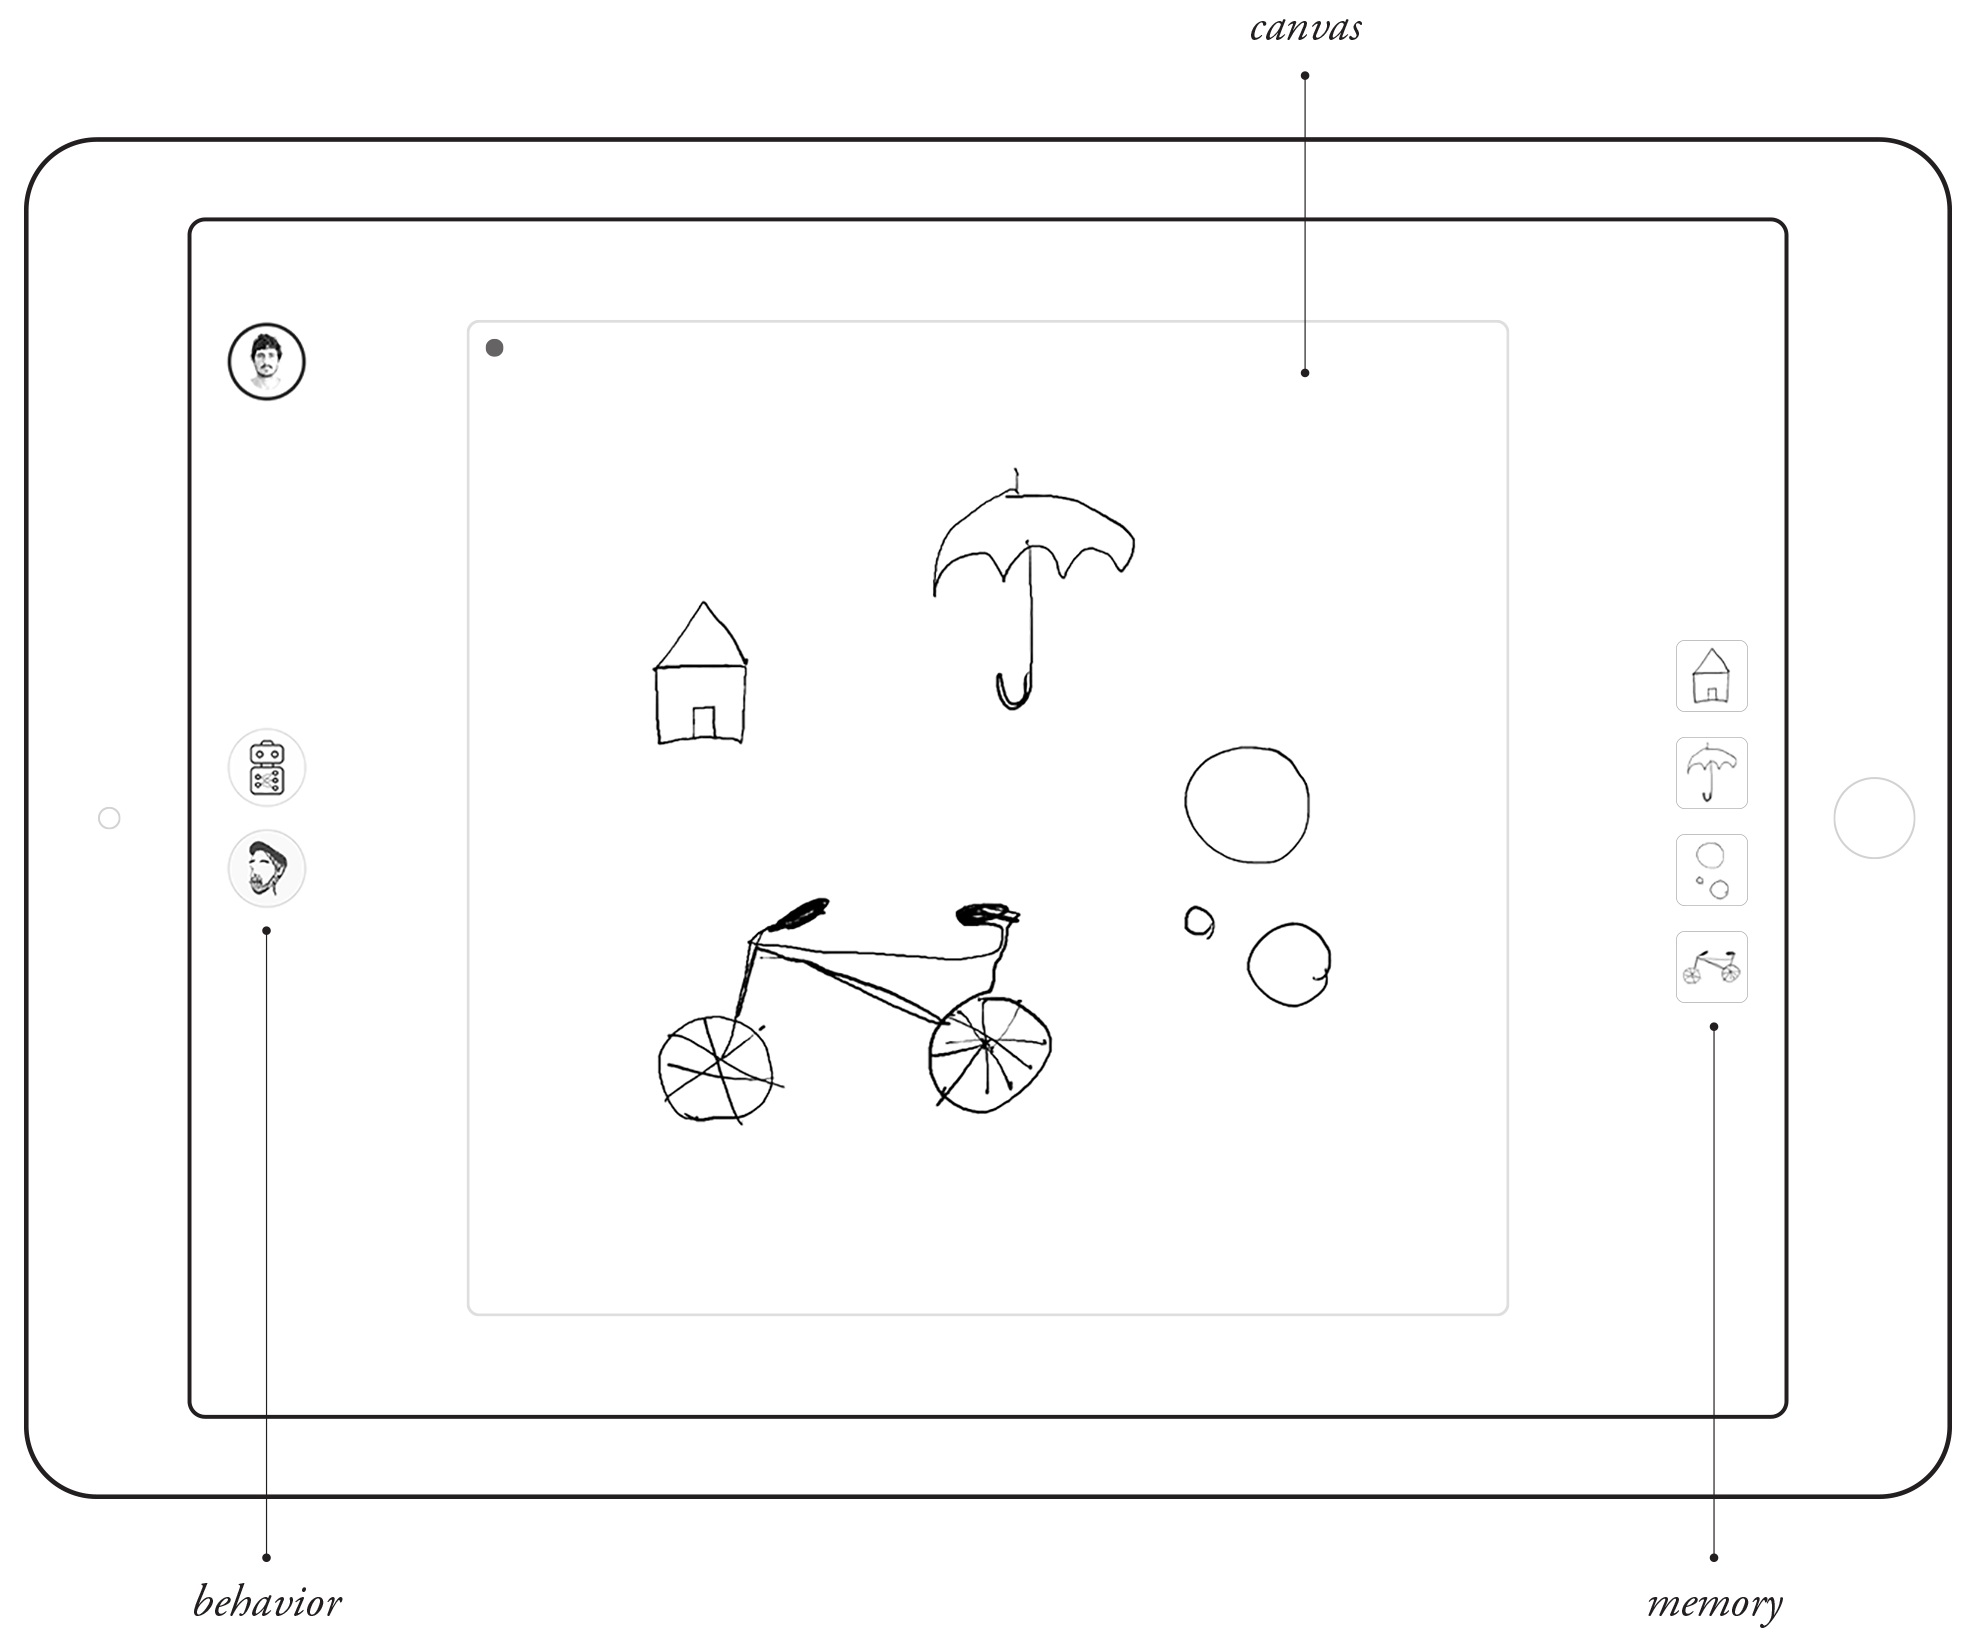 Nono Martinez Alonso Suggestive Drawing Among Human And Artificial Intelligences